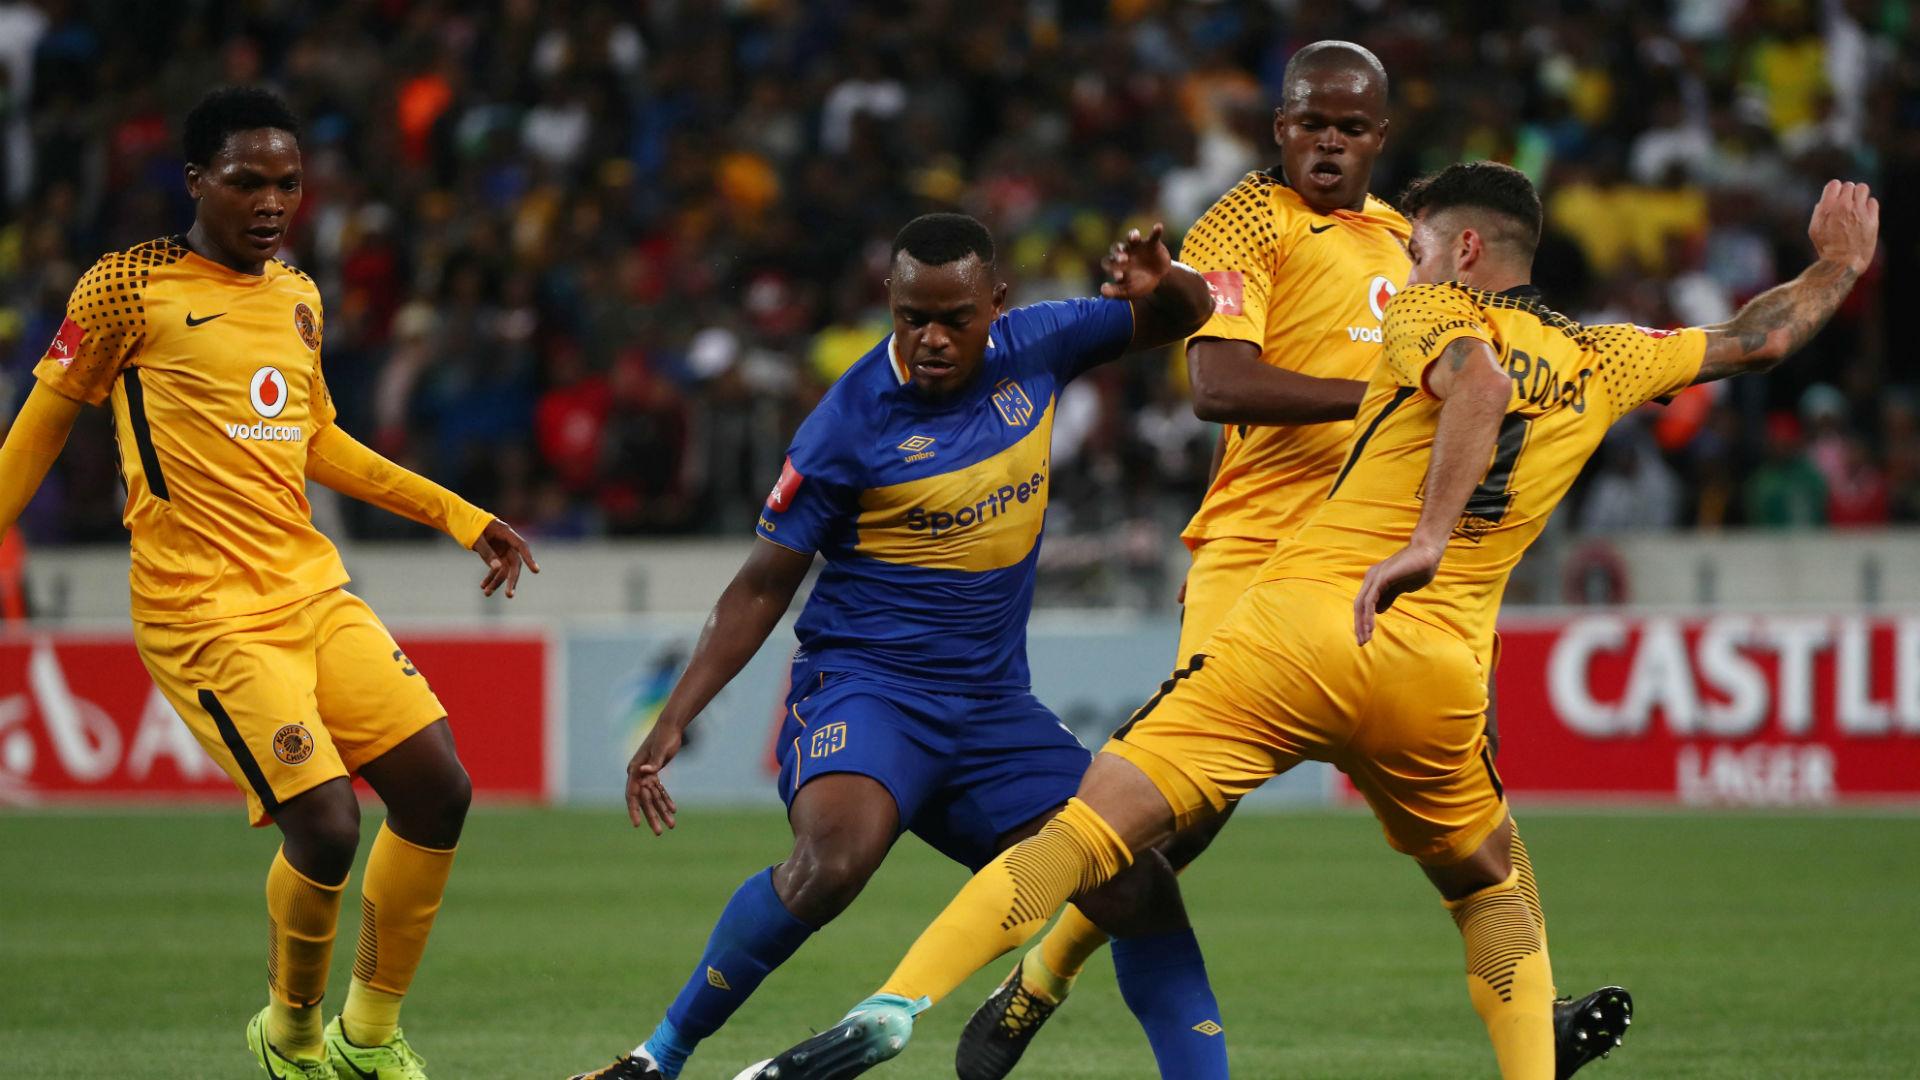 Kaizer Chiefs, Wiseman Meyiwa, Daniel Cardoso & Willard Katsande & Cape Town City, Ayanda Patosi